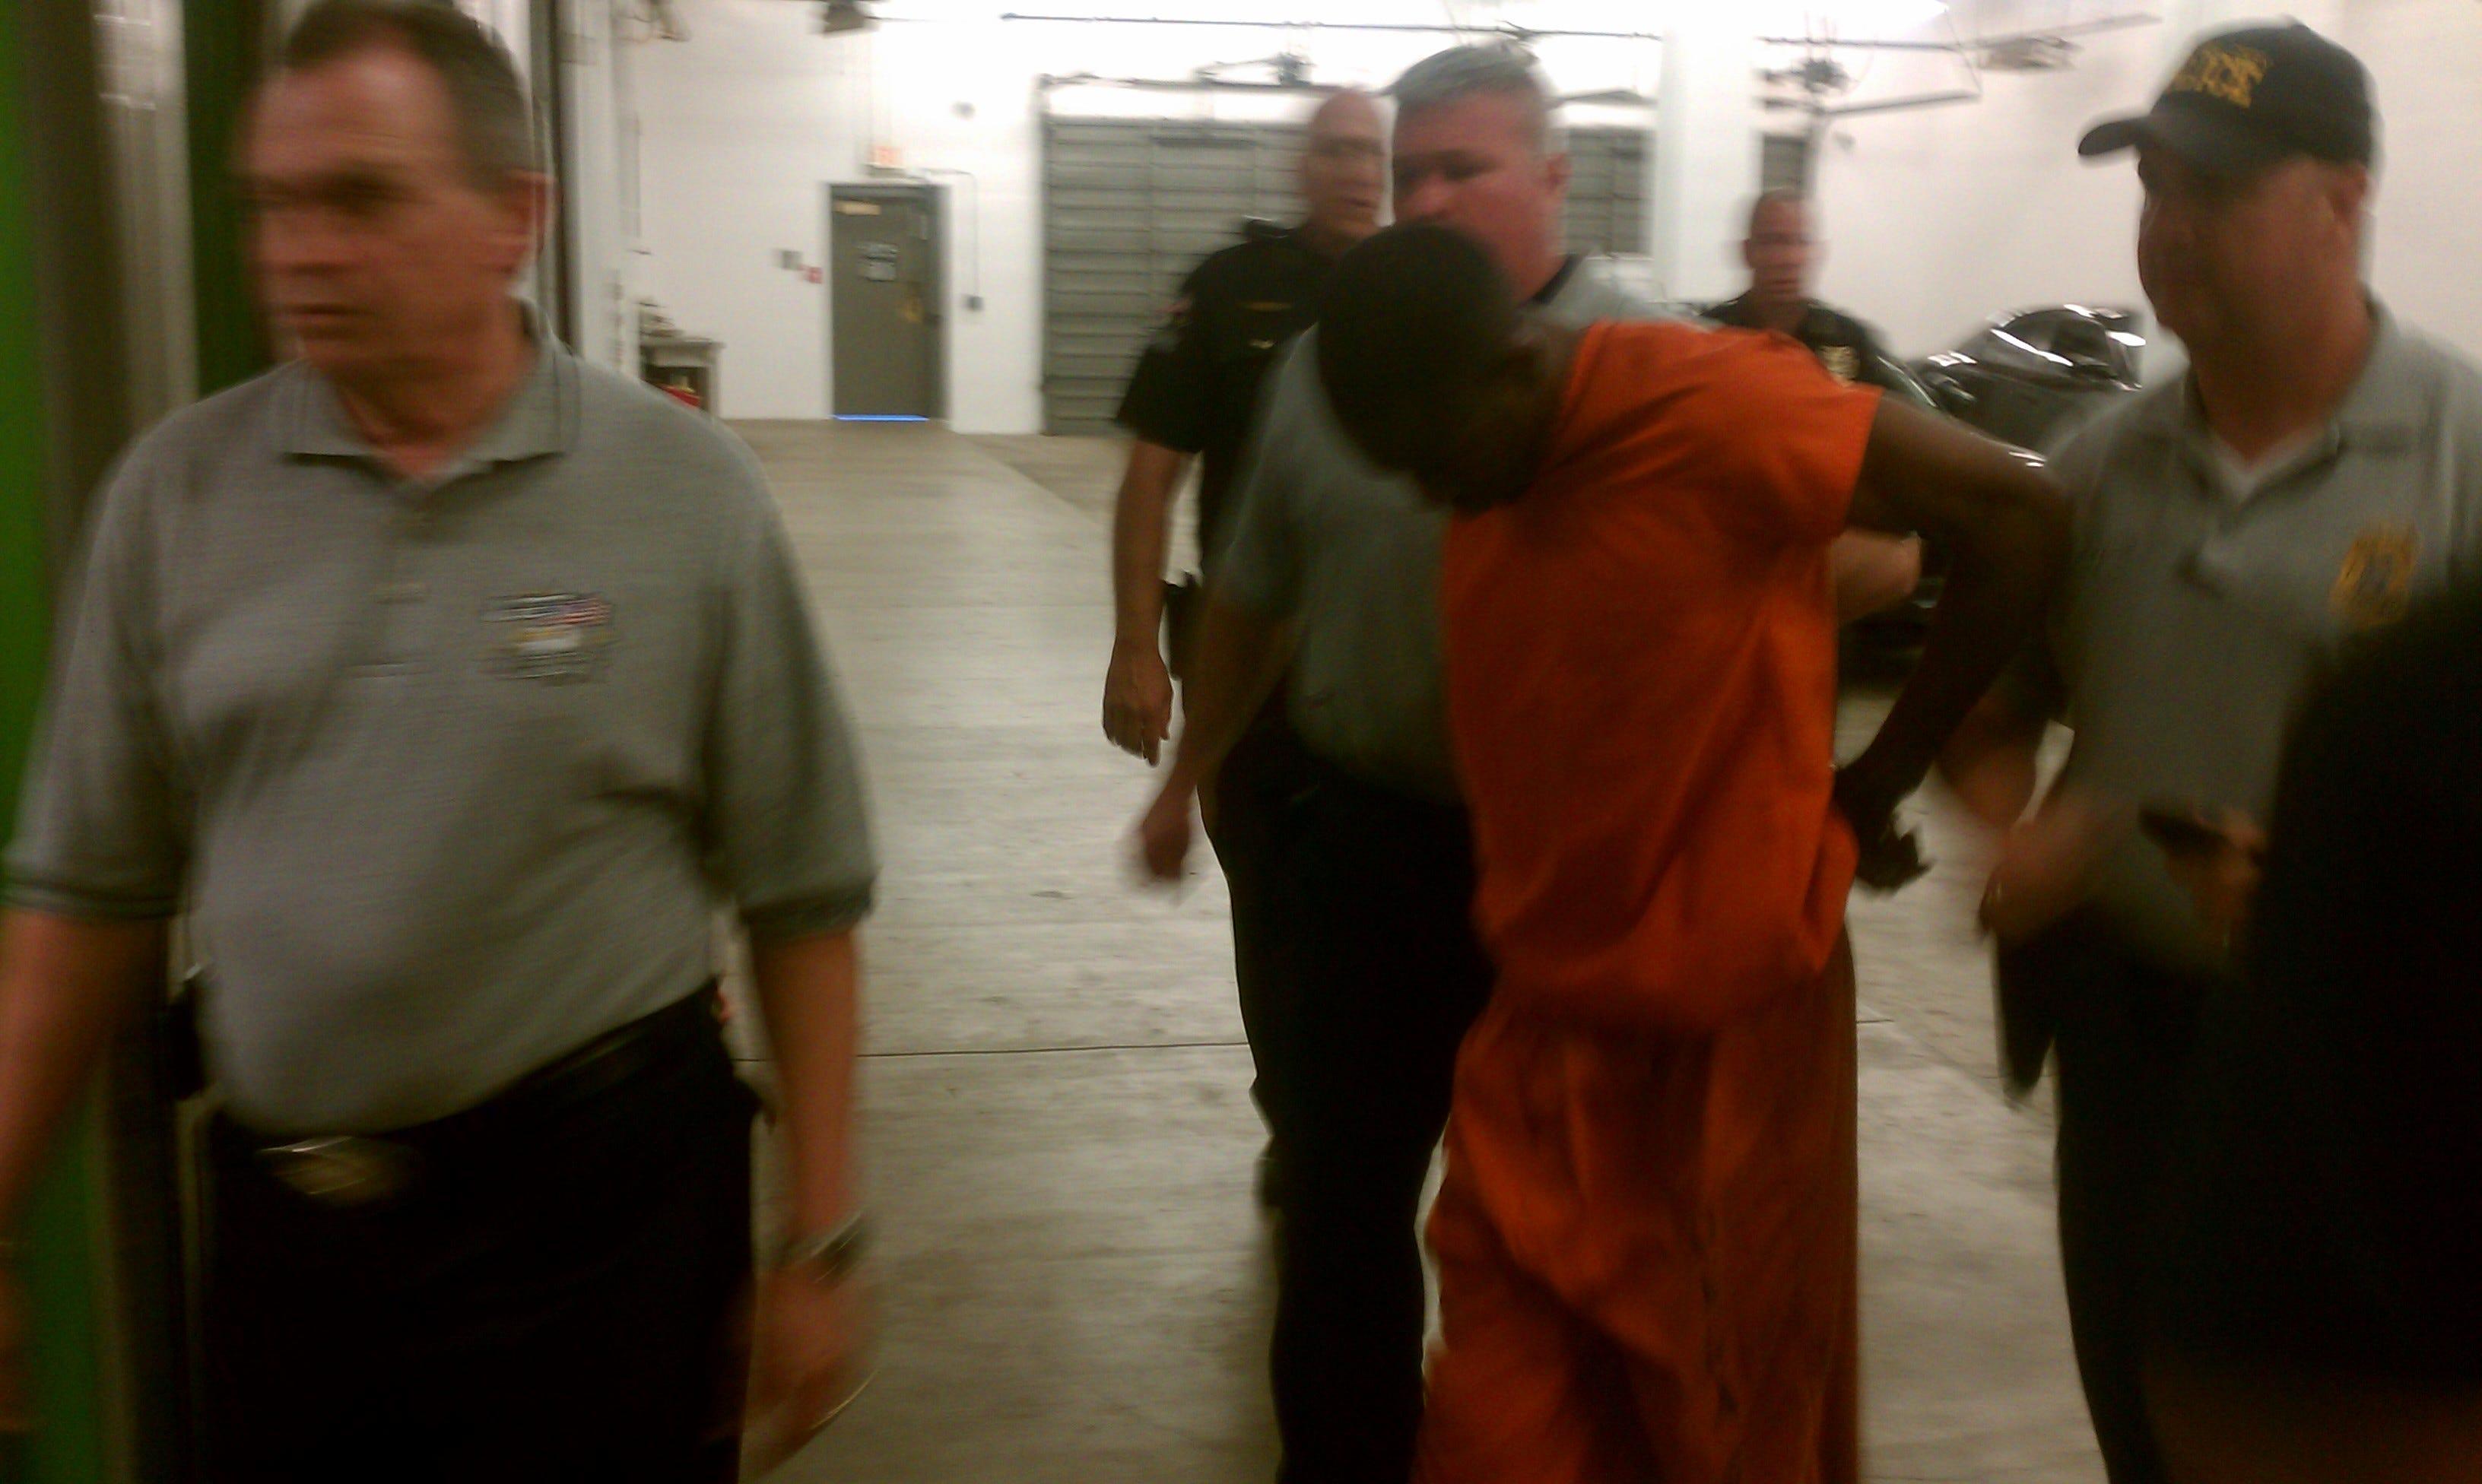 Second Suspect In Deputy Shooting Taken Into Custody